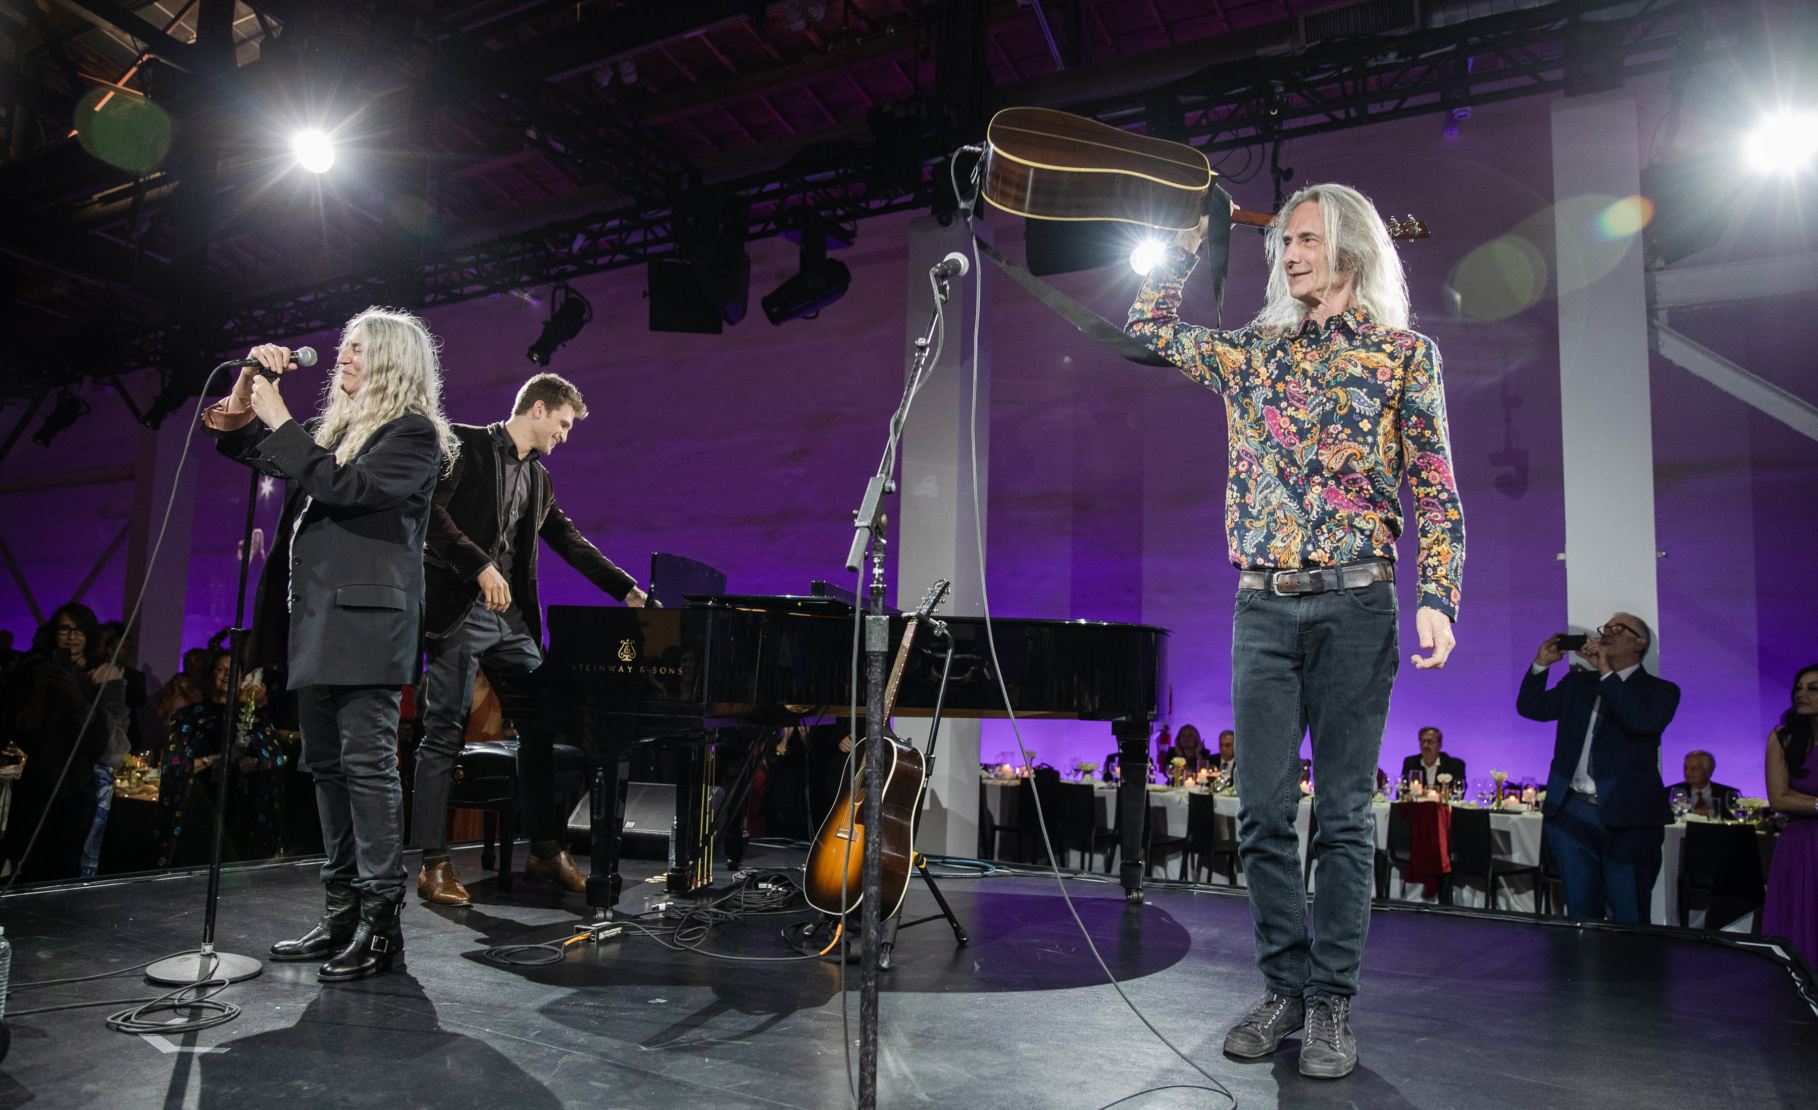 Patti Smith, Keegan Allen and Lenny Kaye